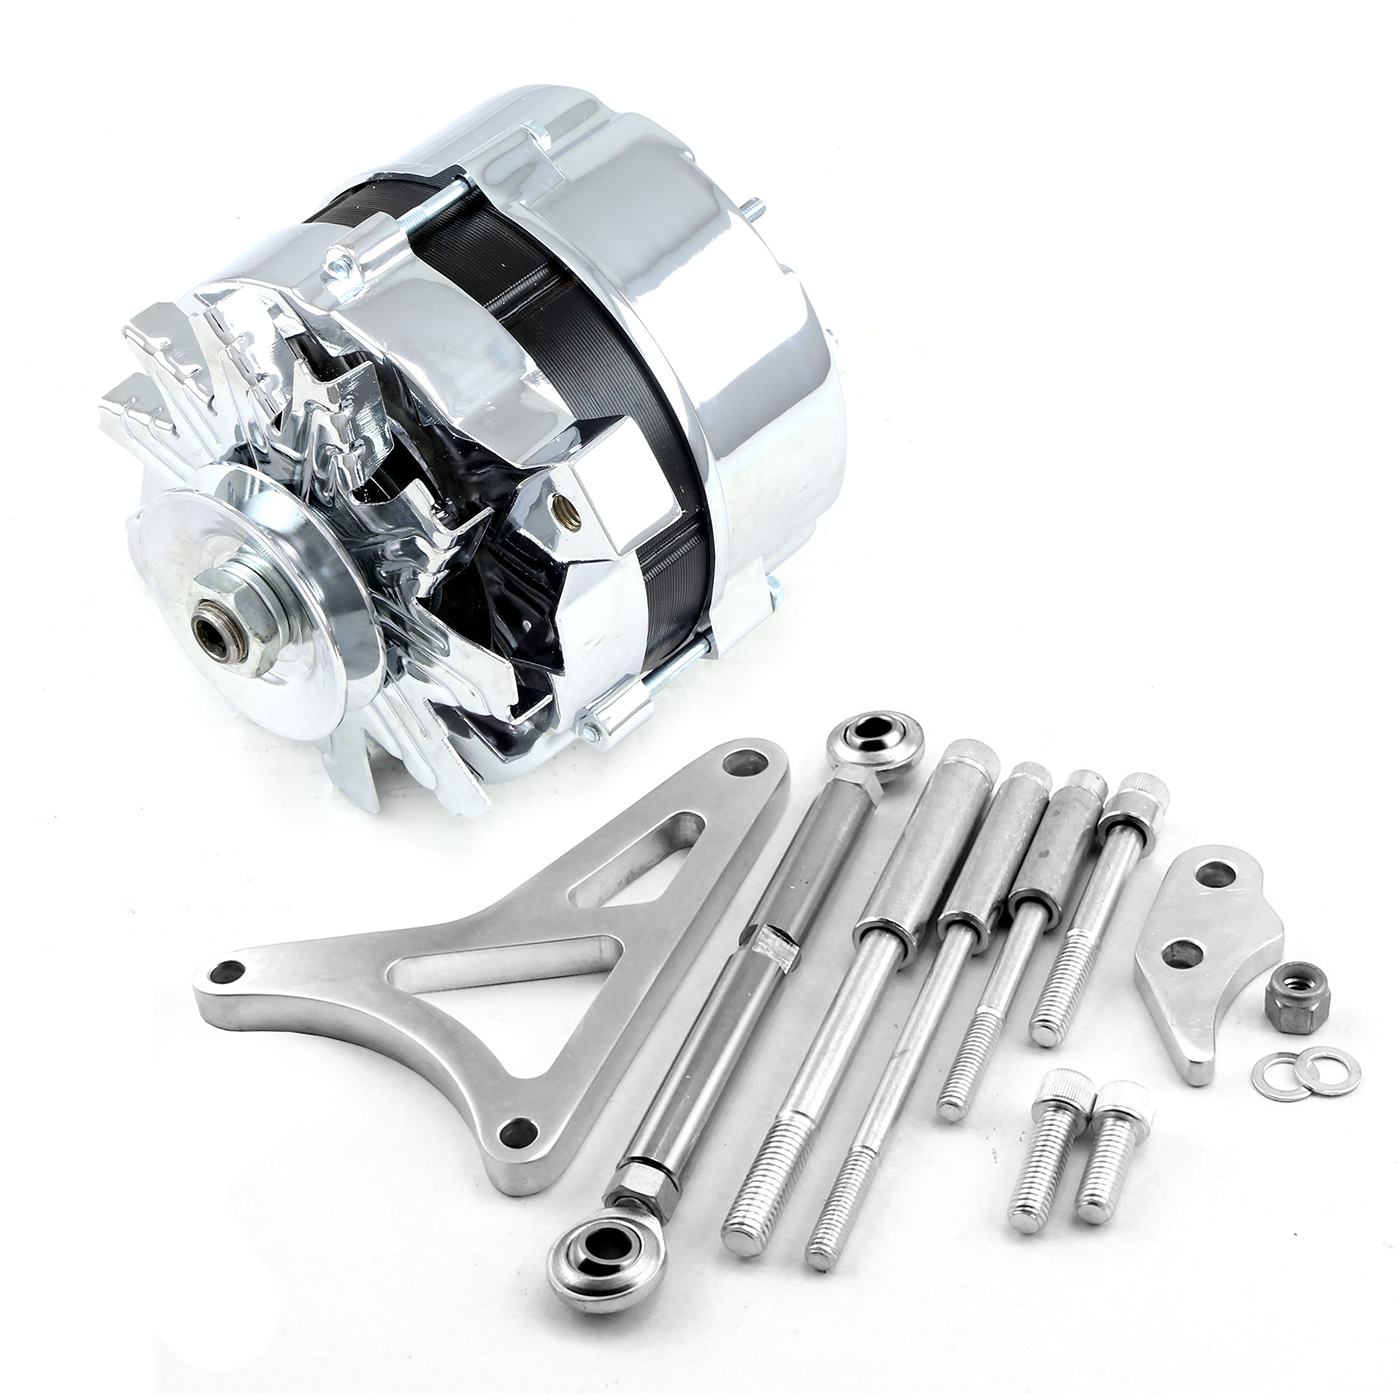 Ford SB 289 302 Windsor 100 Amp V-Belt High Output Alternator & Bracket Kit